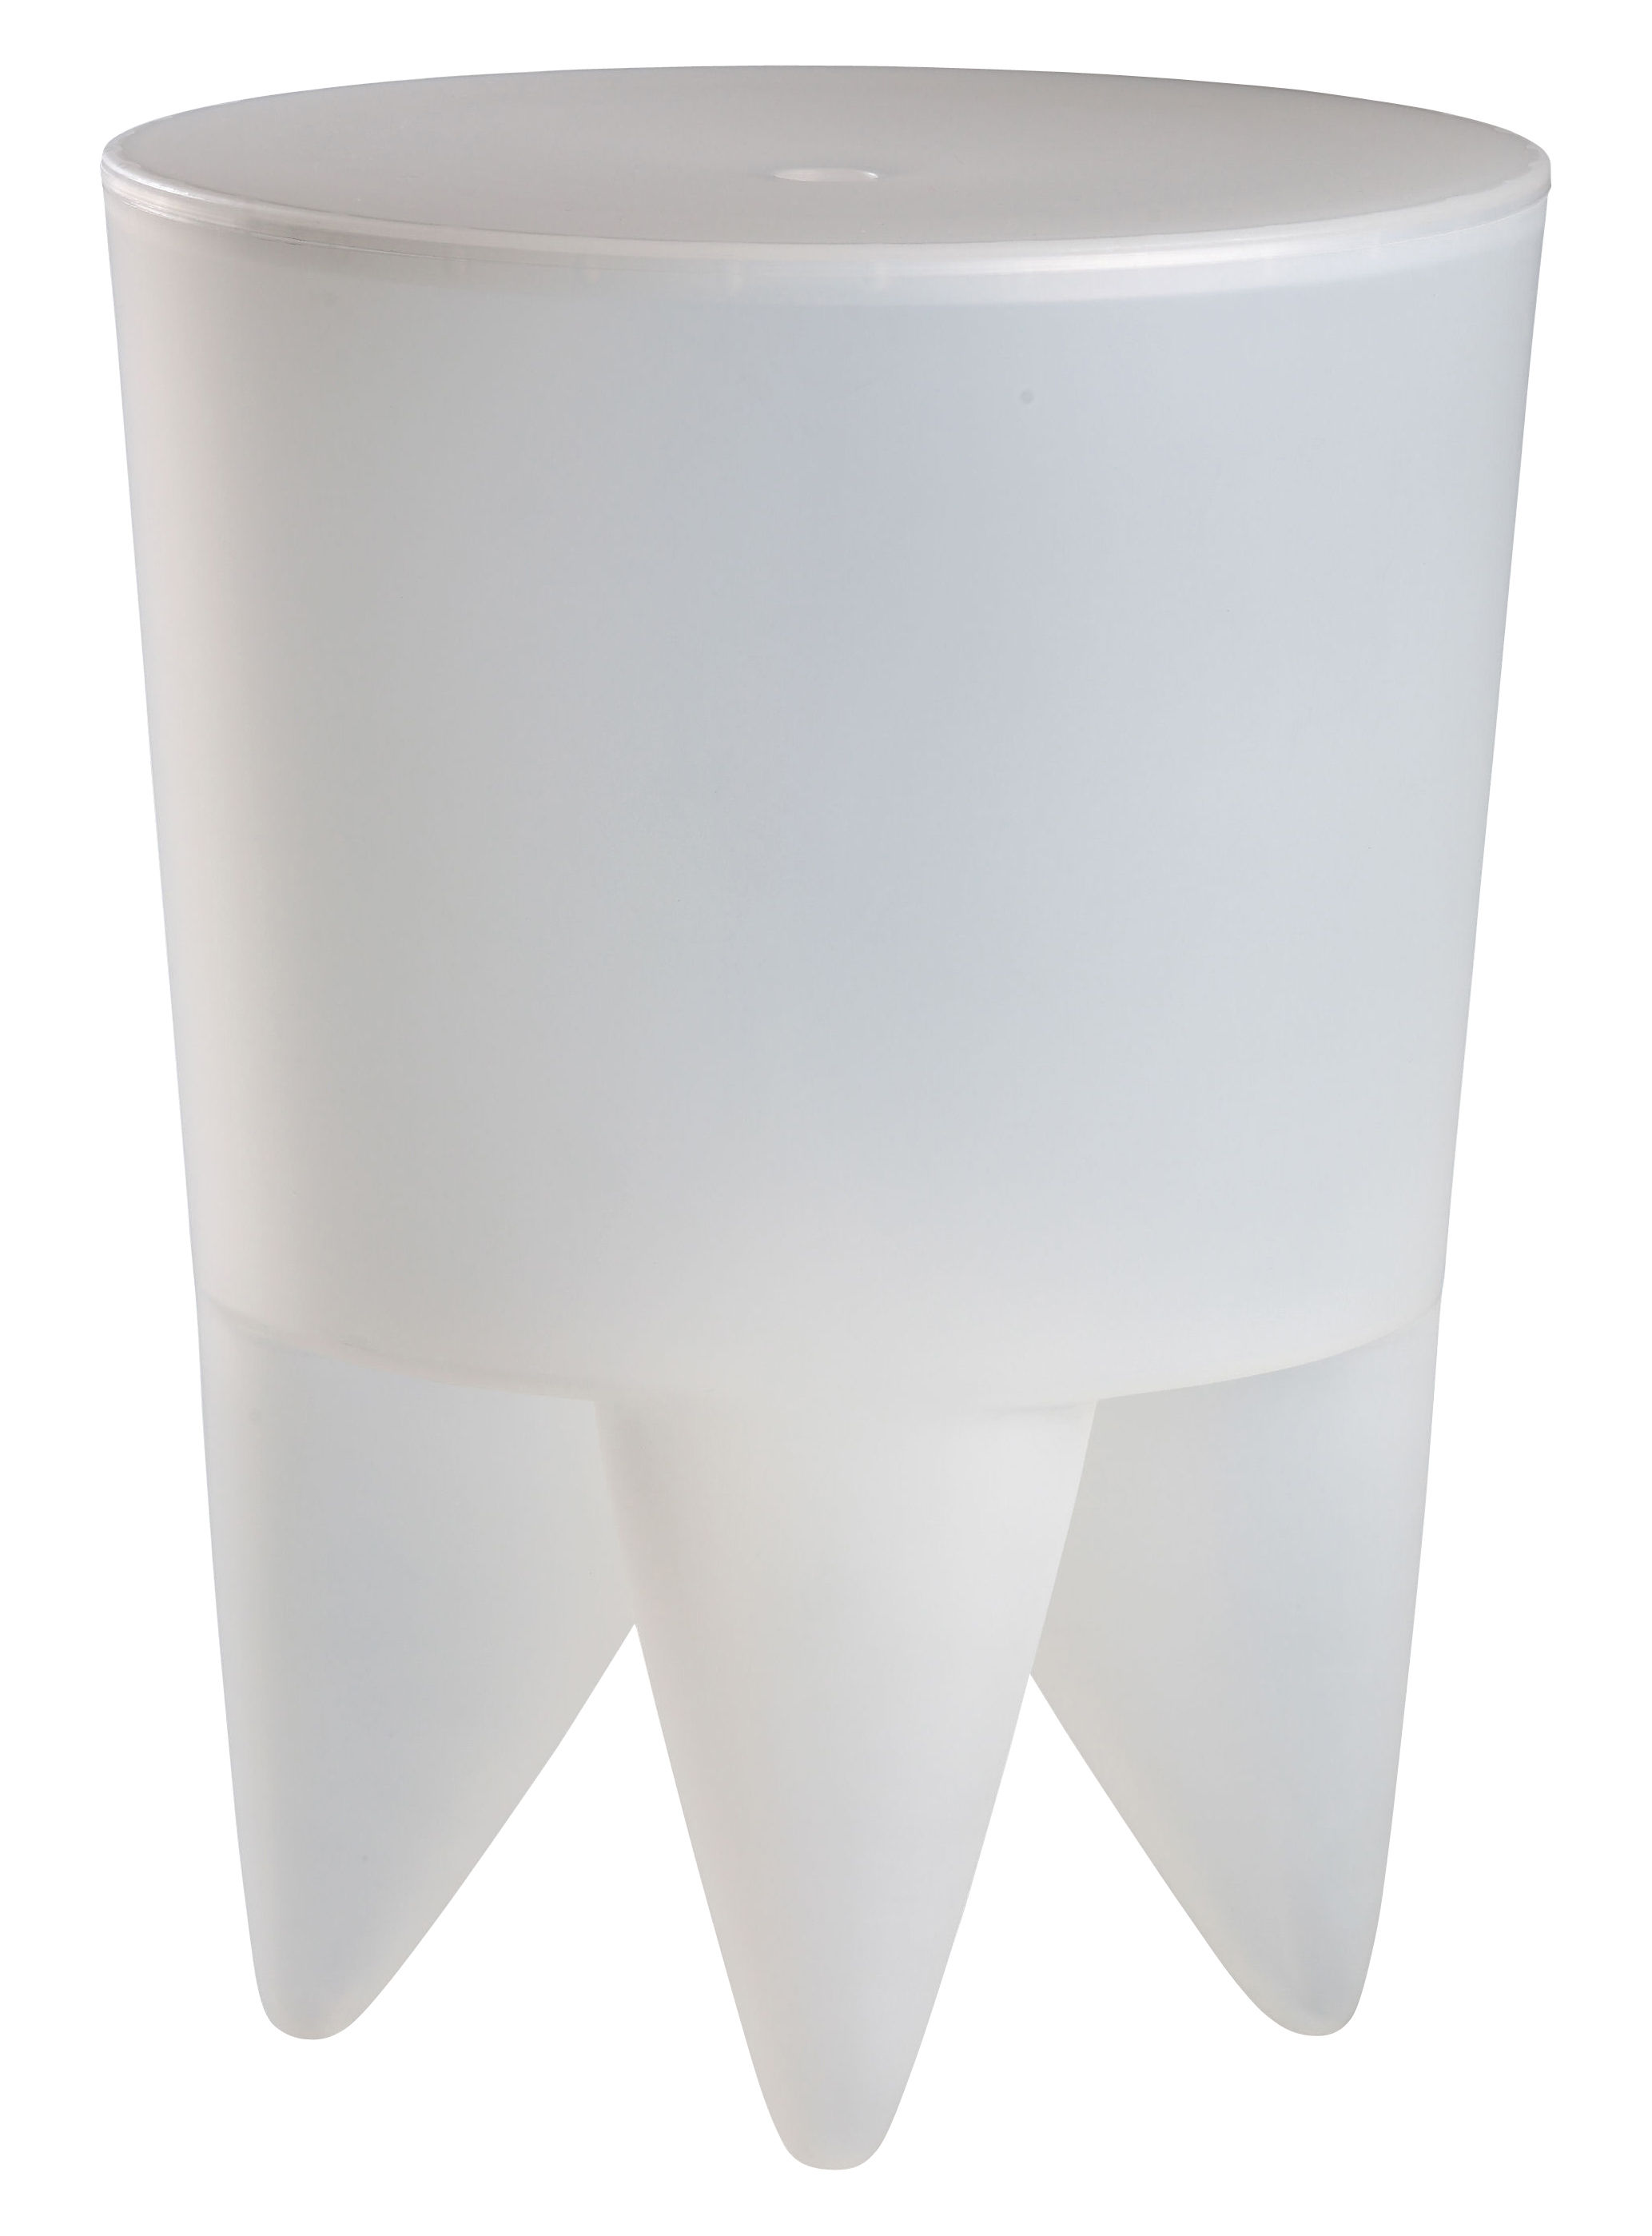 Tabouret new bubu 1er coffre plastique blanc - Tabouret bubu philippe starck ...